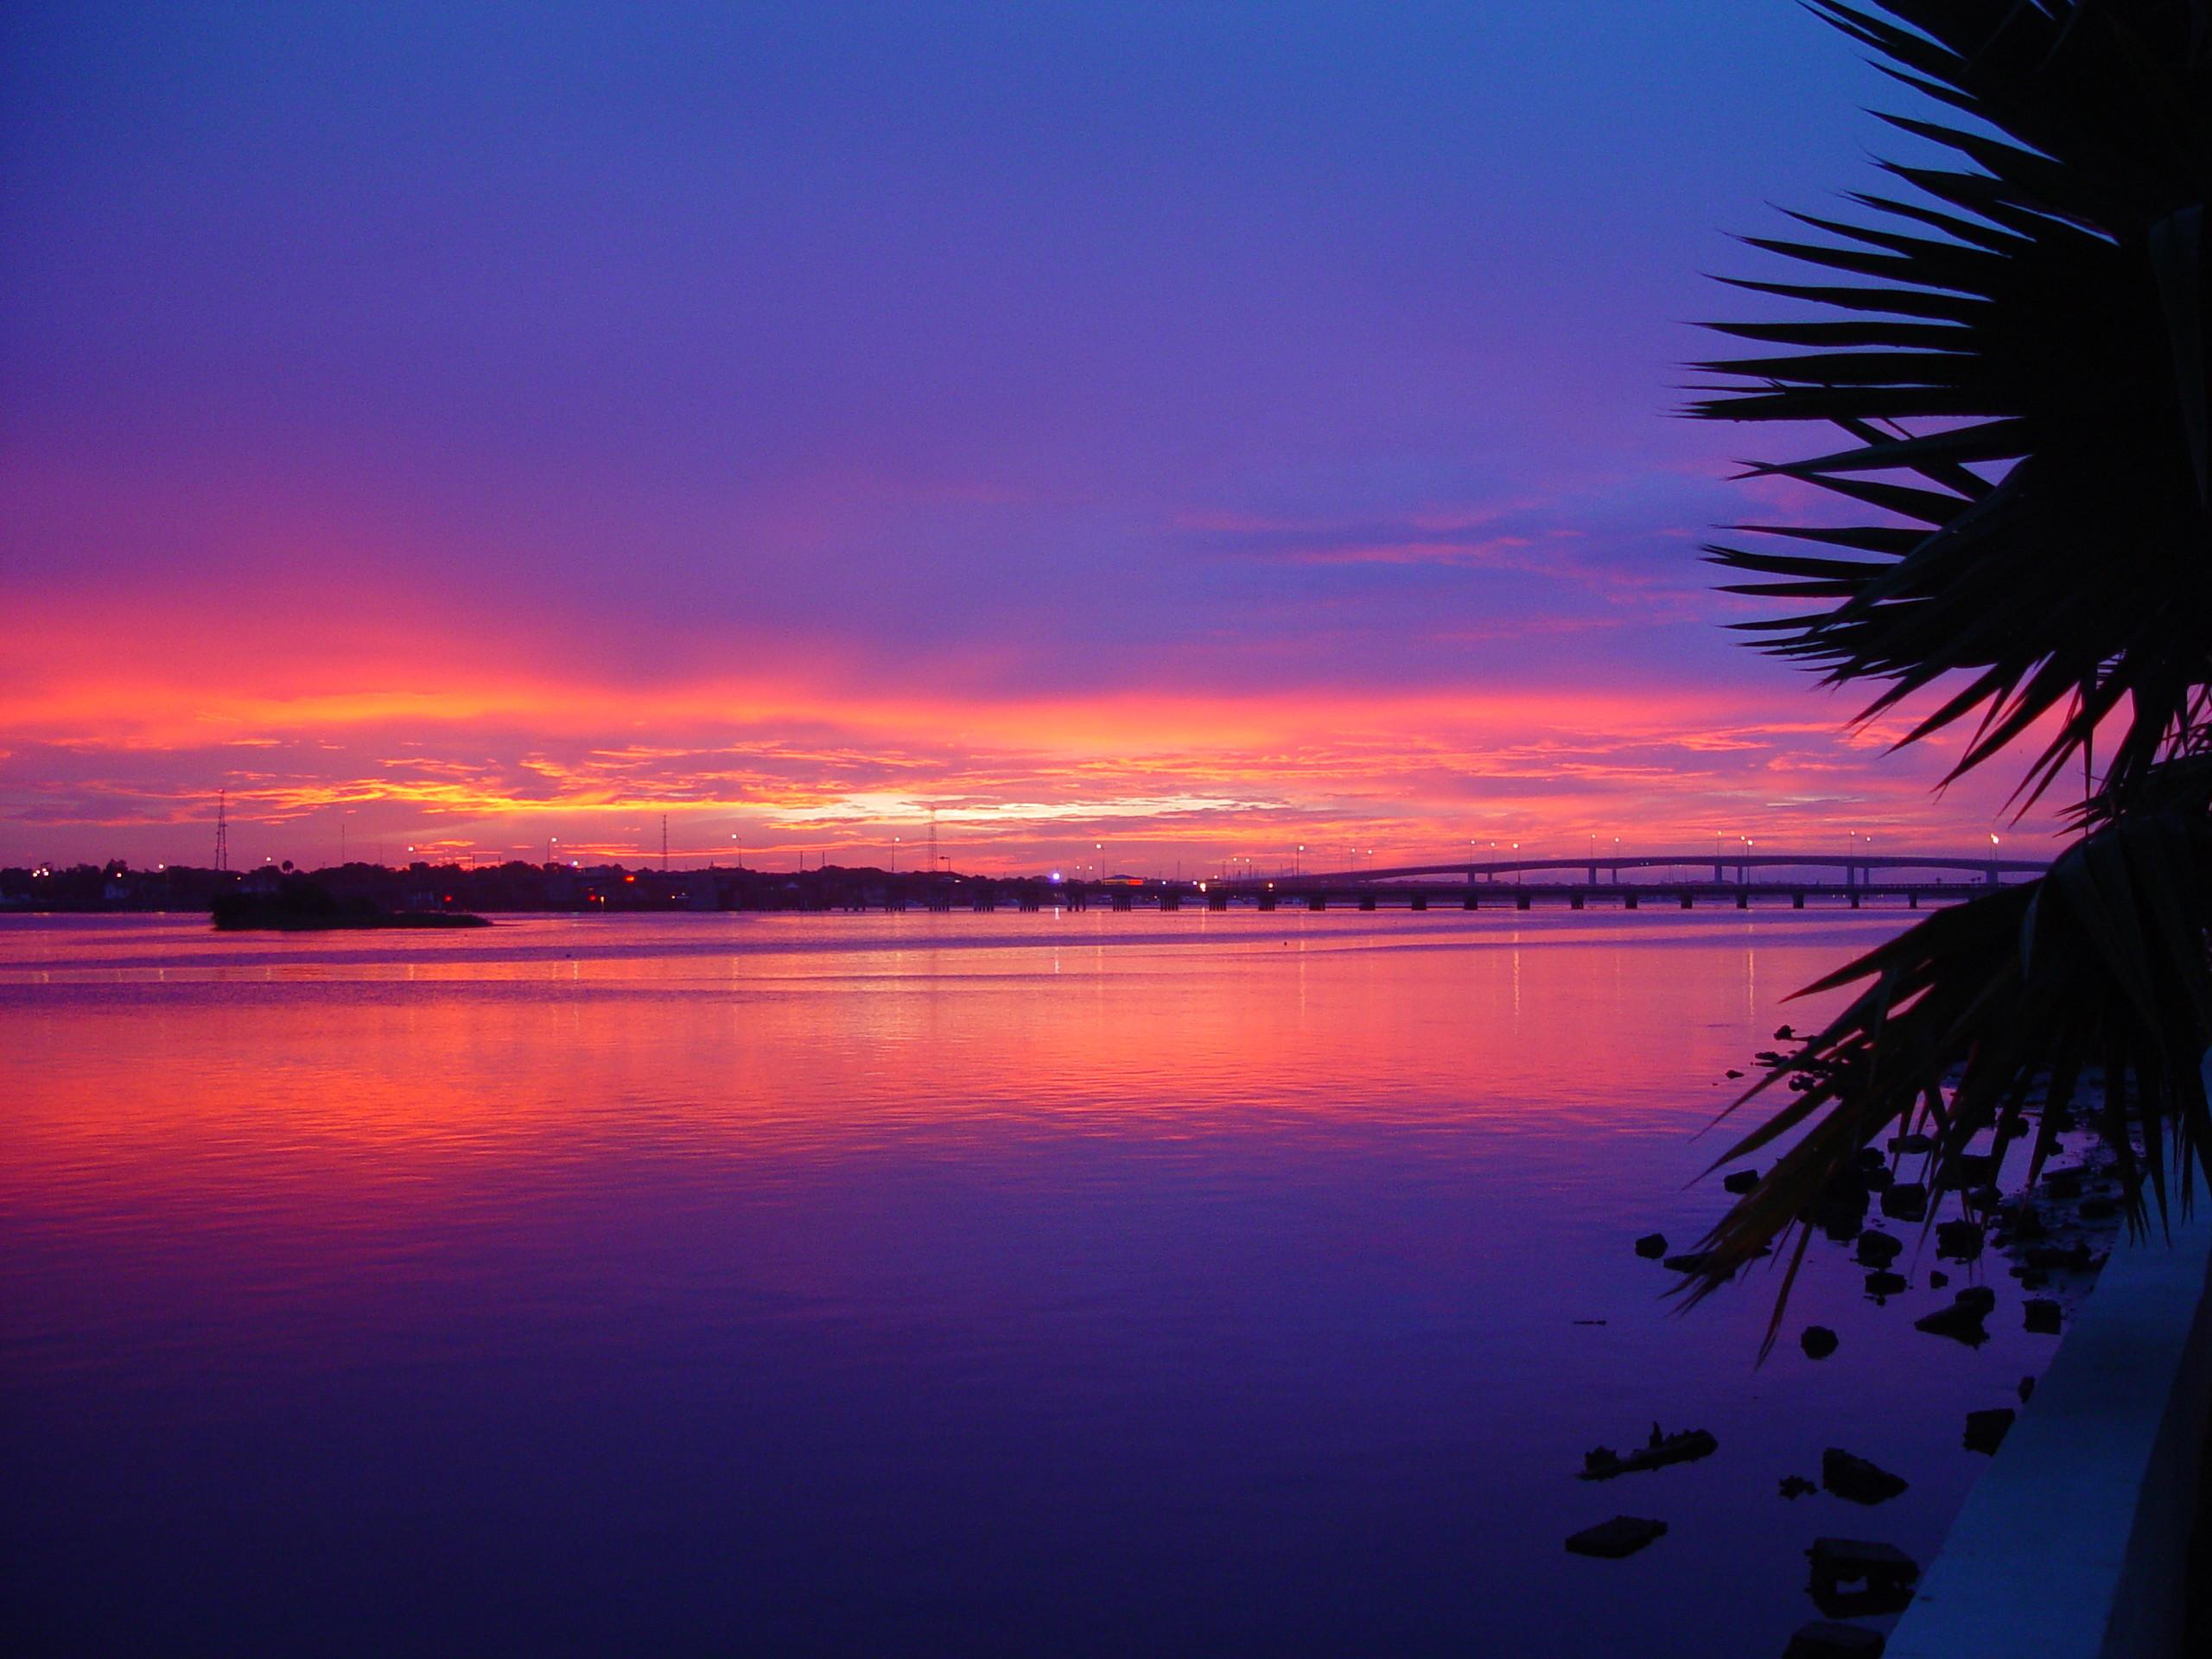 Beautiful Beach Sunset Wallpaper (61+ images) - photo#17